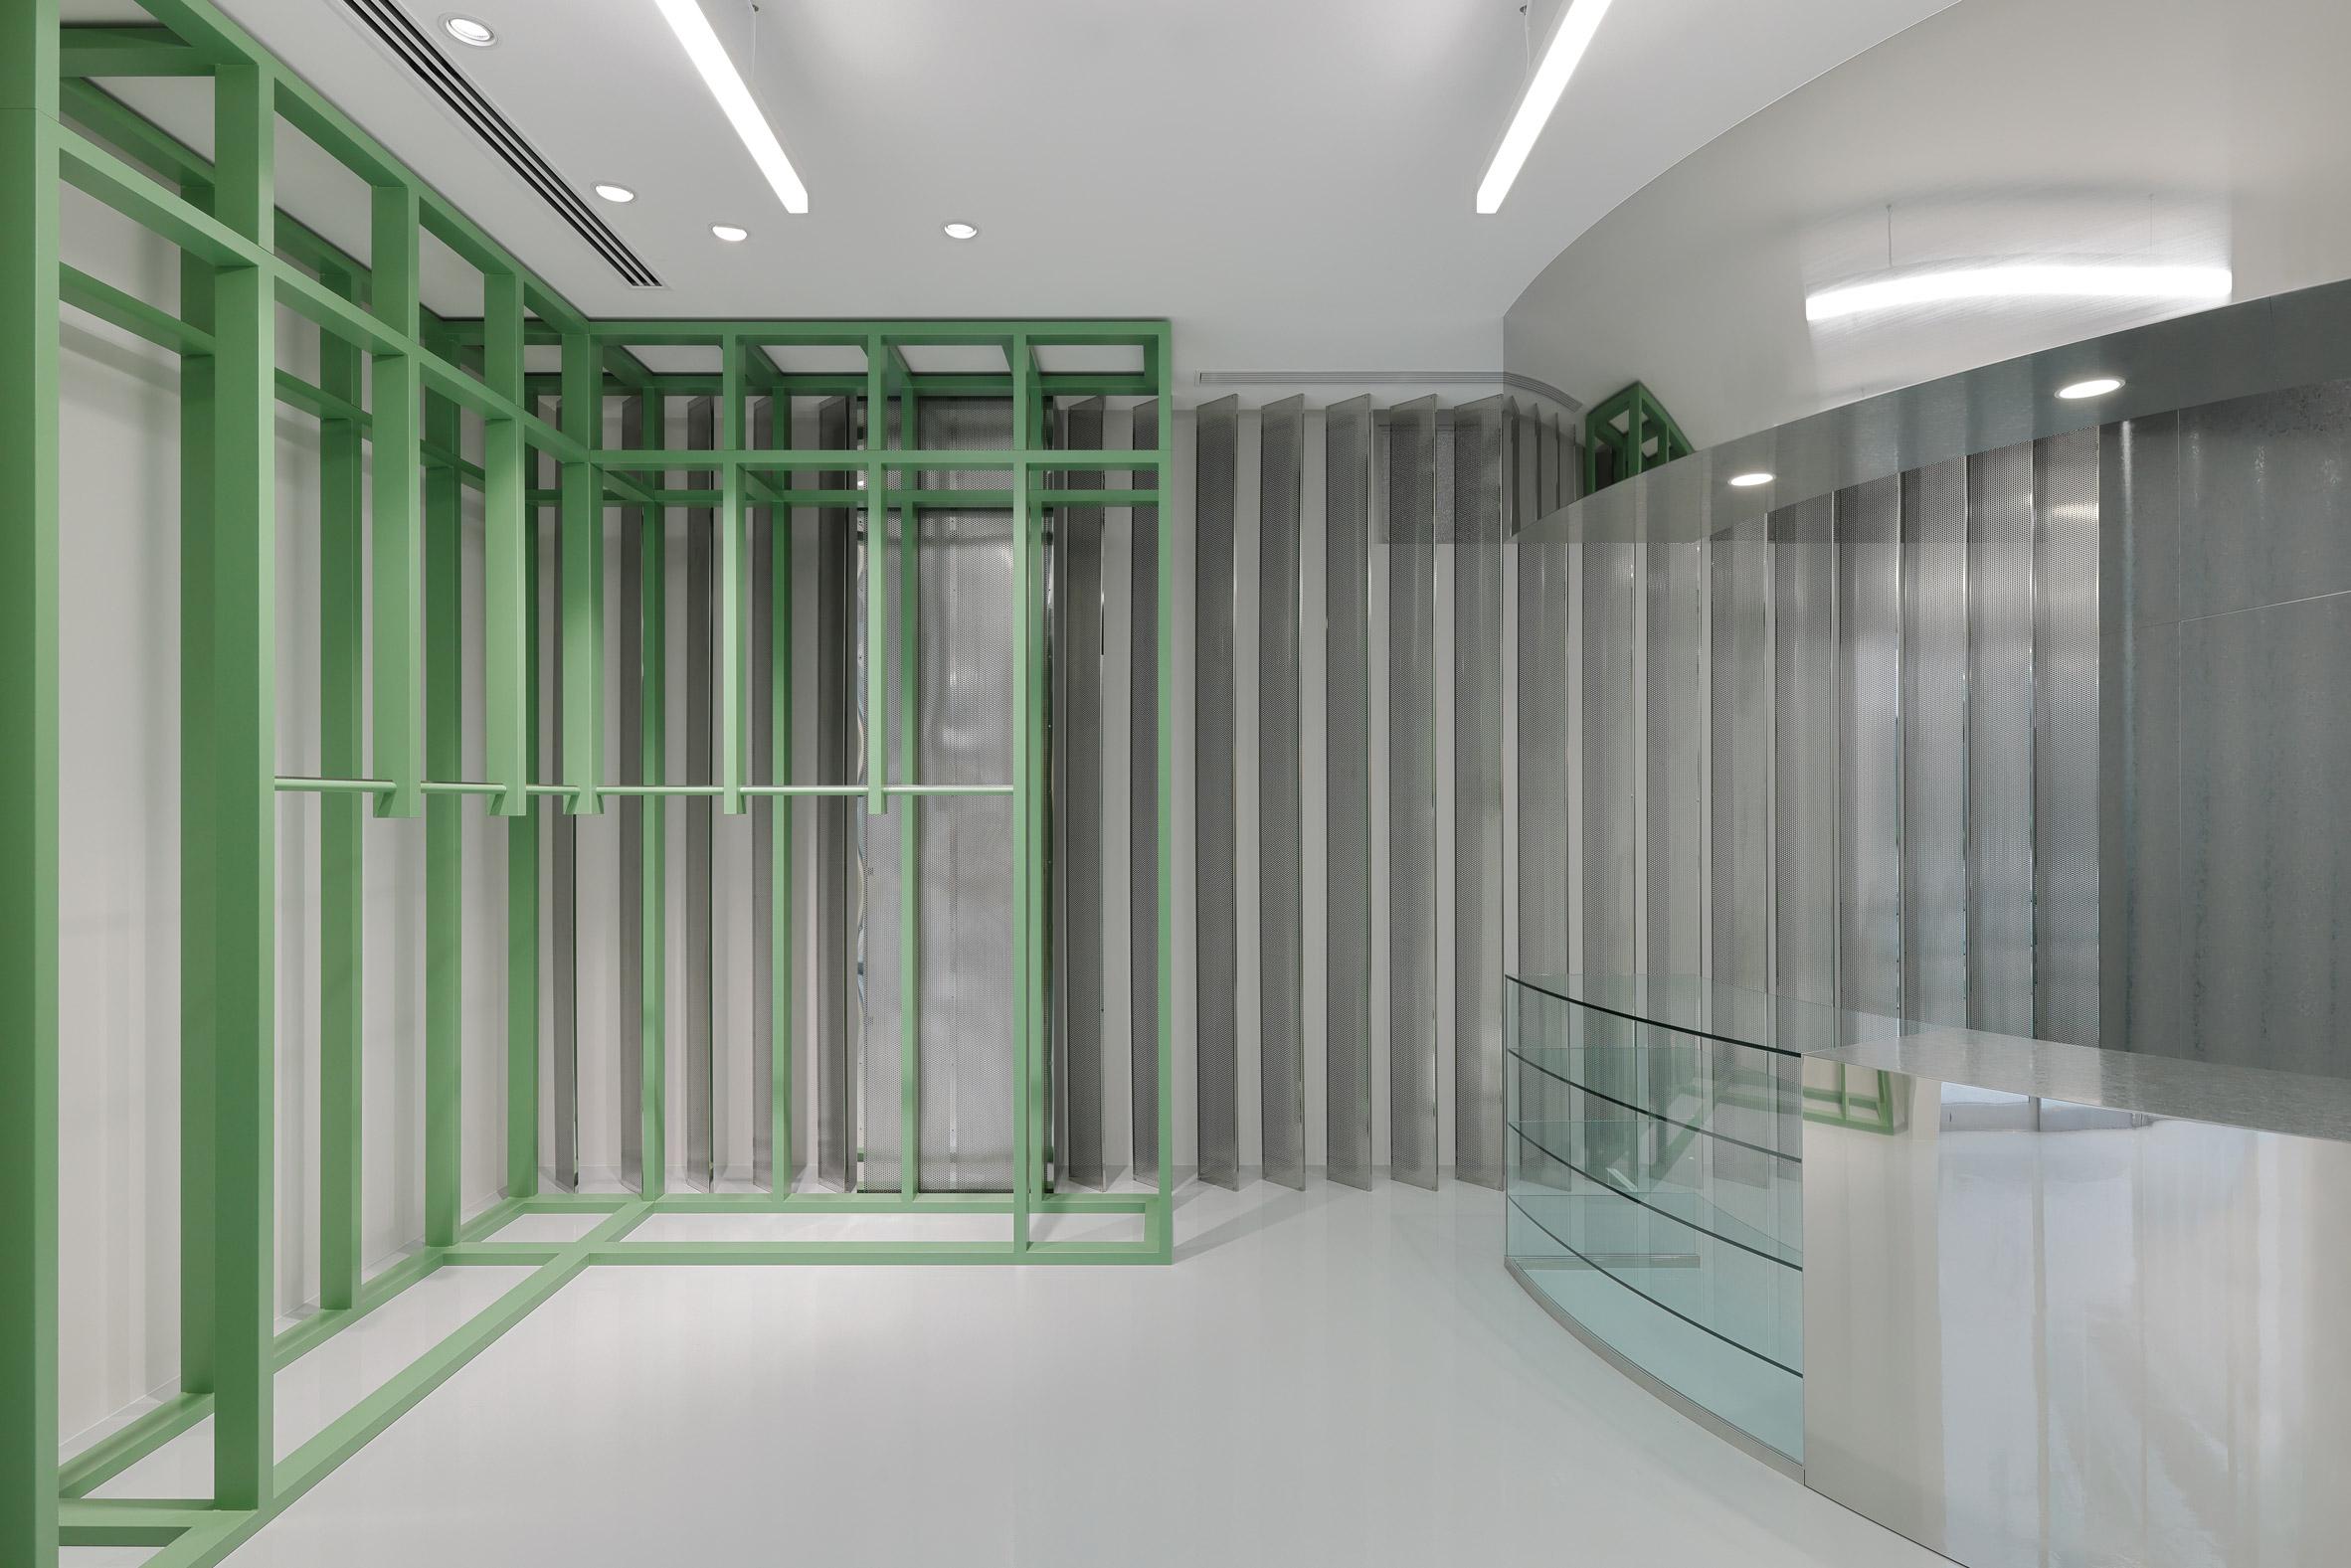 Green shelving and mirrored storage in Stüssy Shibuya store